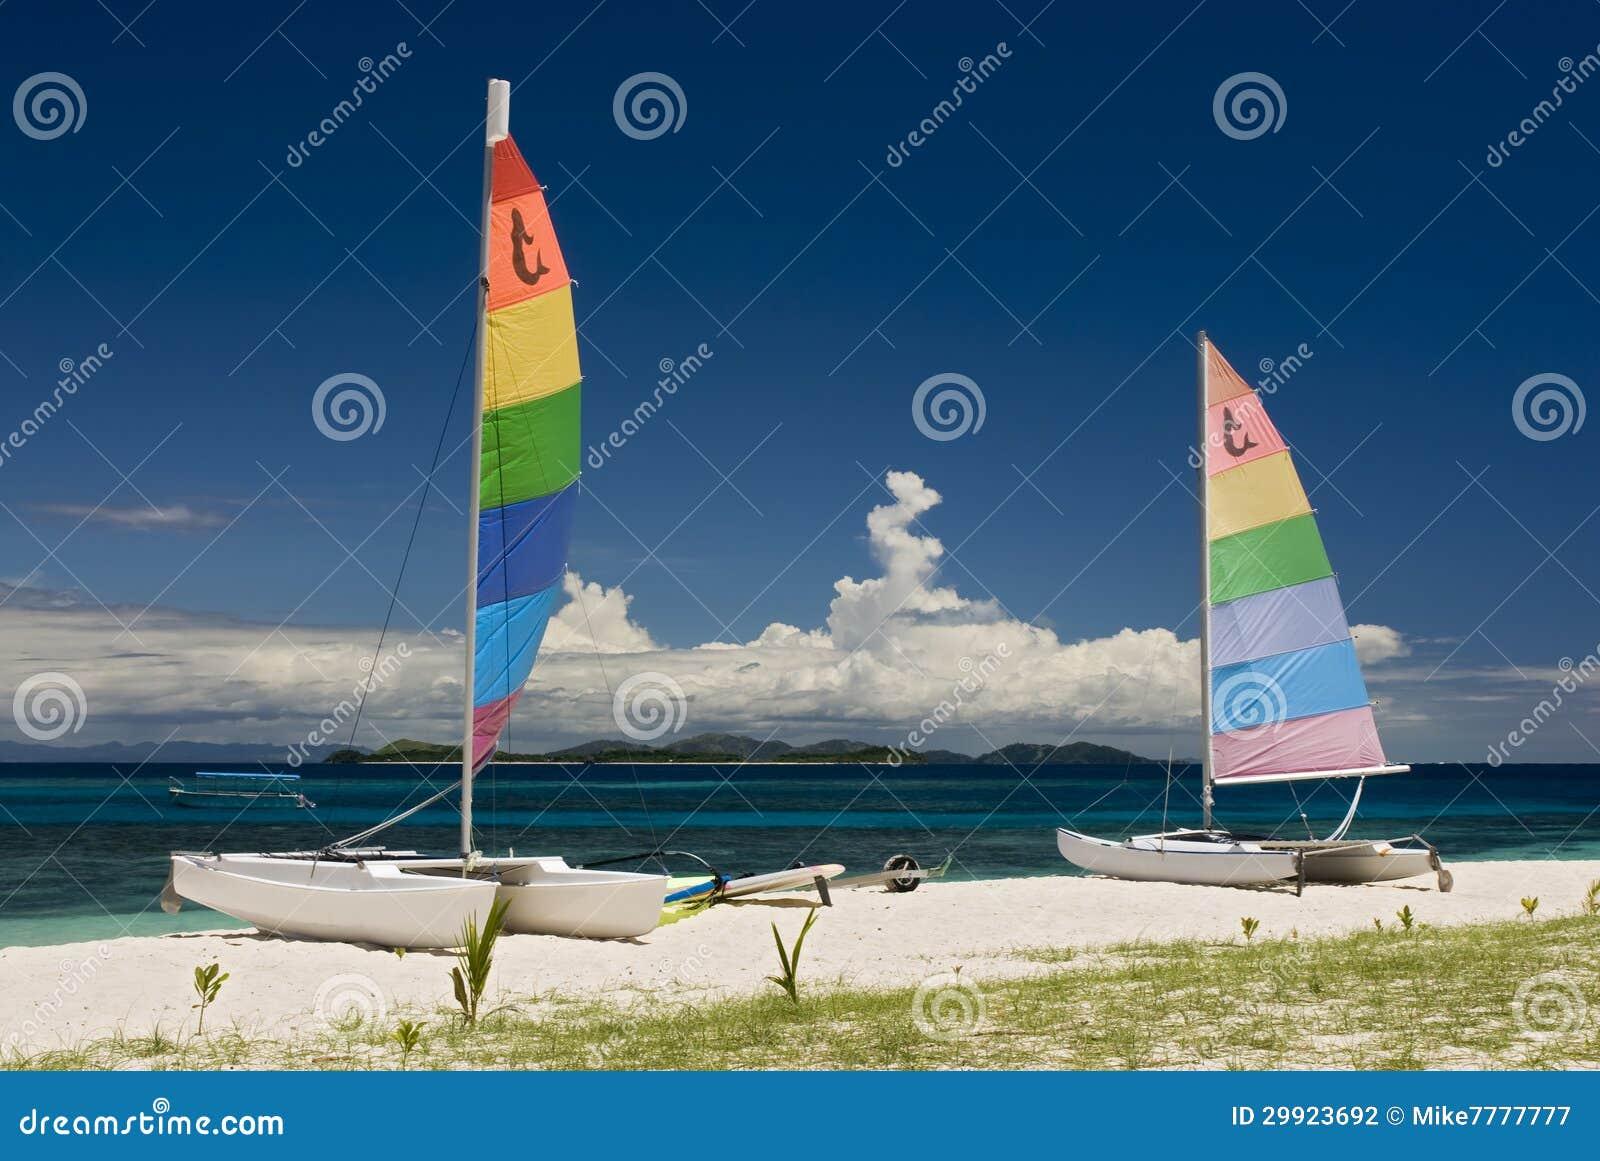 Catamarans on sandy beach, Fiji